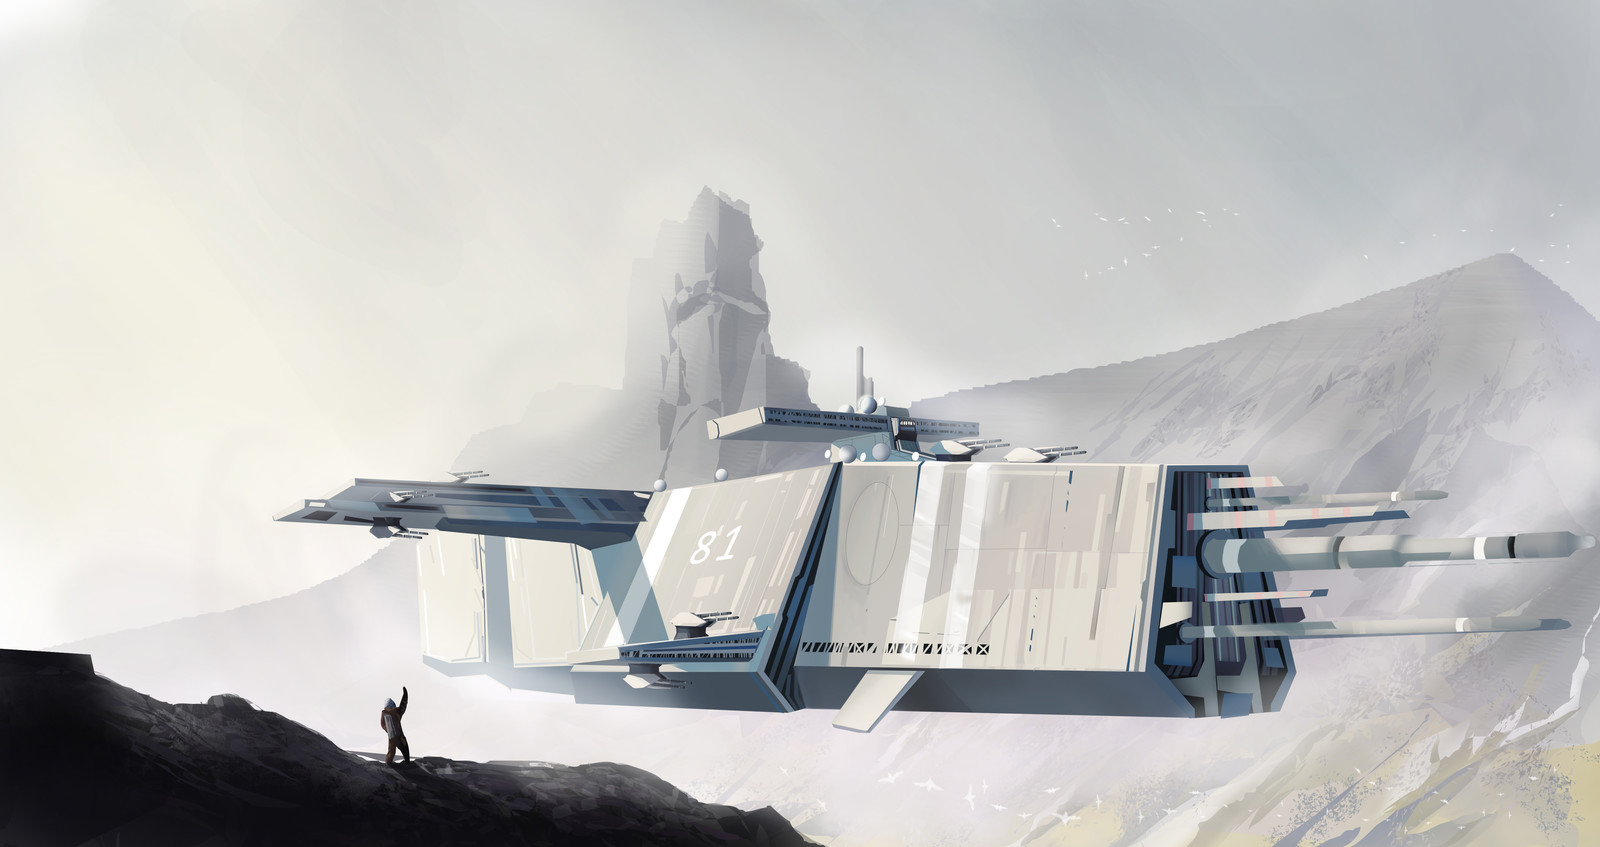 Alliance cruiser  on planet Afrodita